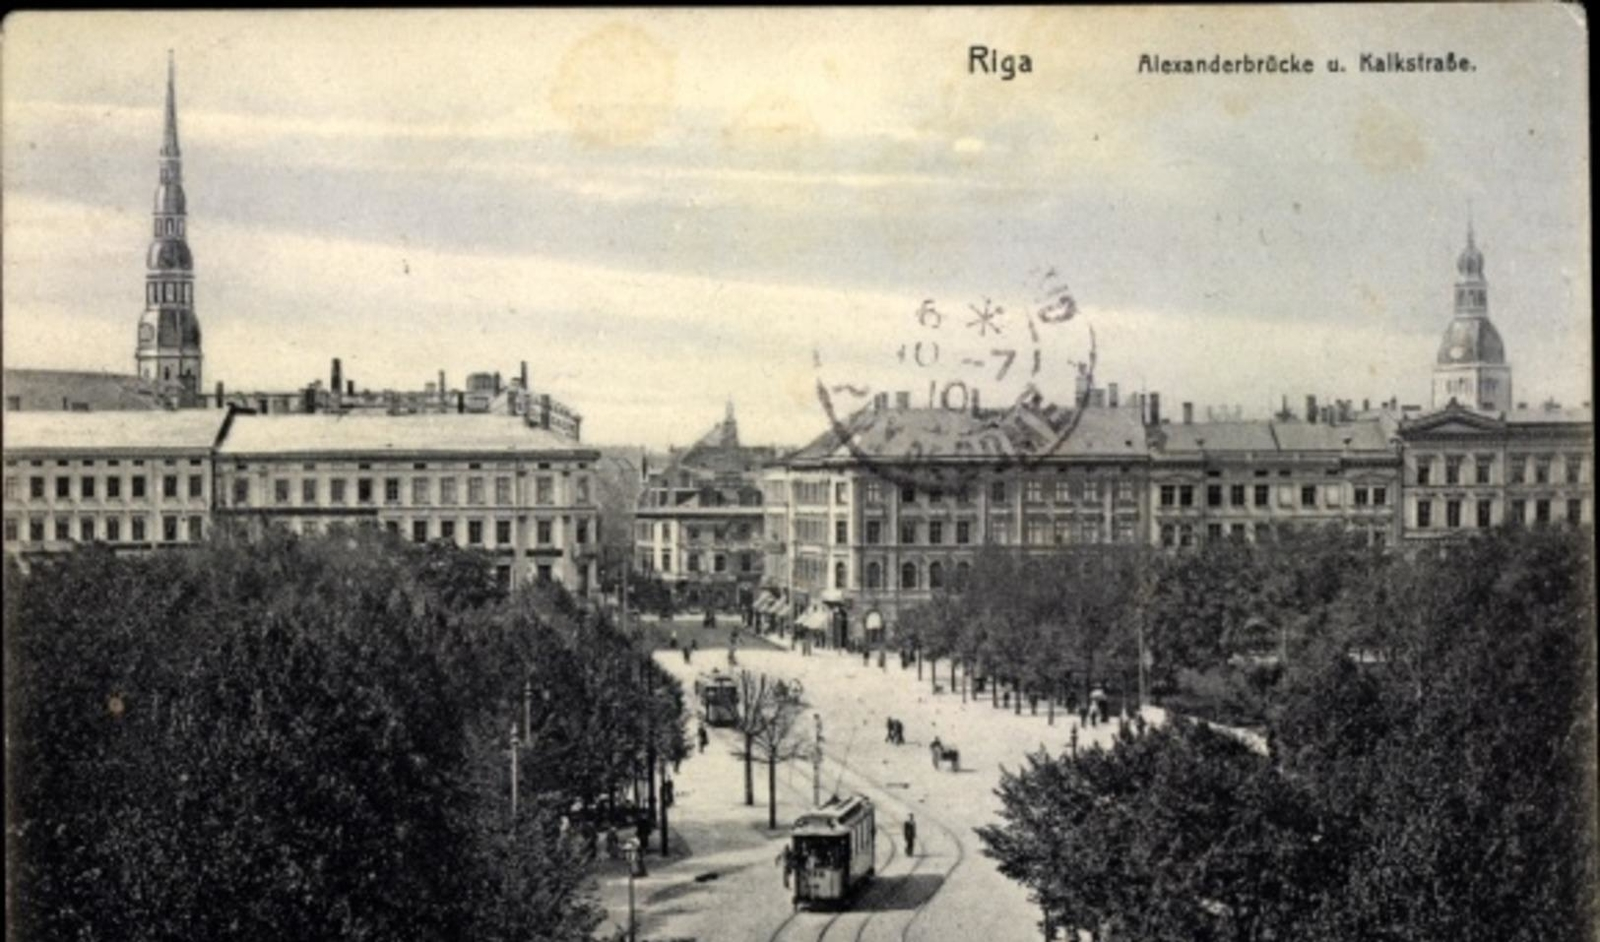 Riga -  Cp Riga Lettland, Alexanderbrücke und Kalkstraße